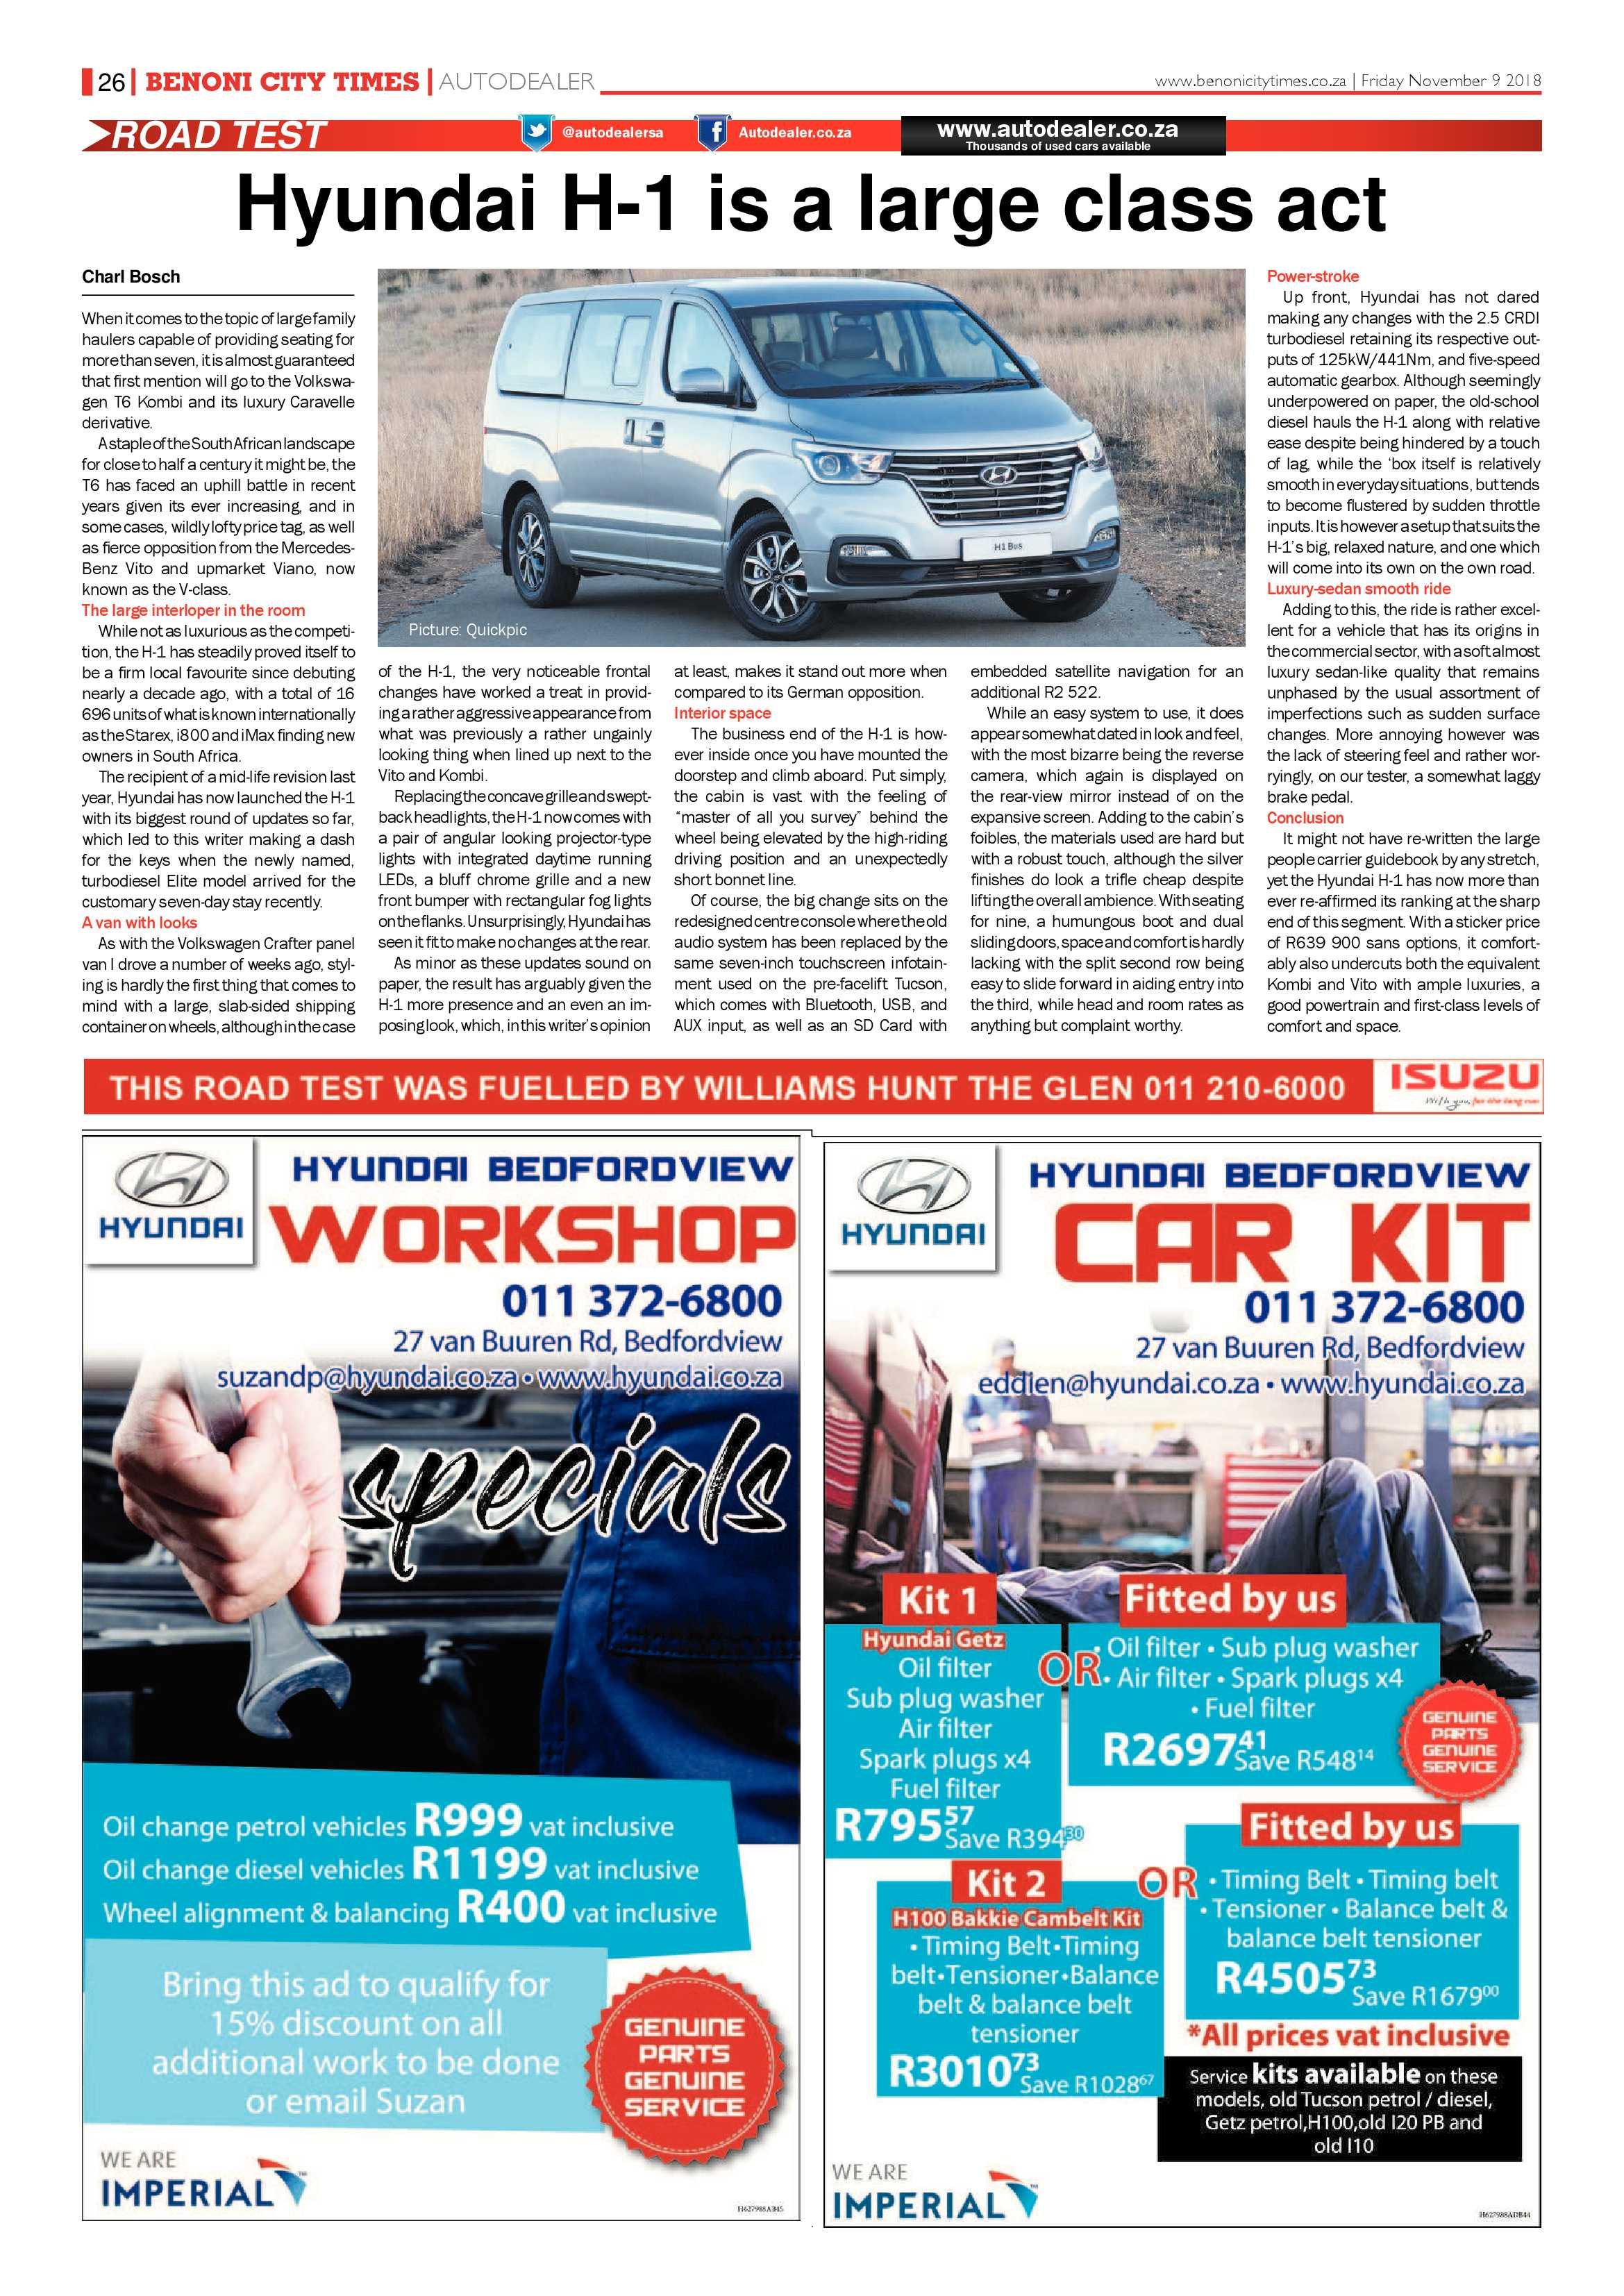 benoni-city-times-08-november-2018-epapers-page-26